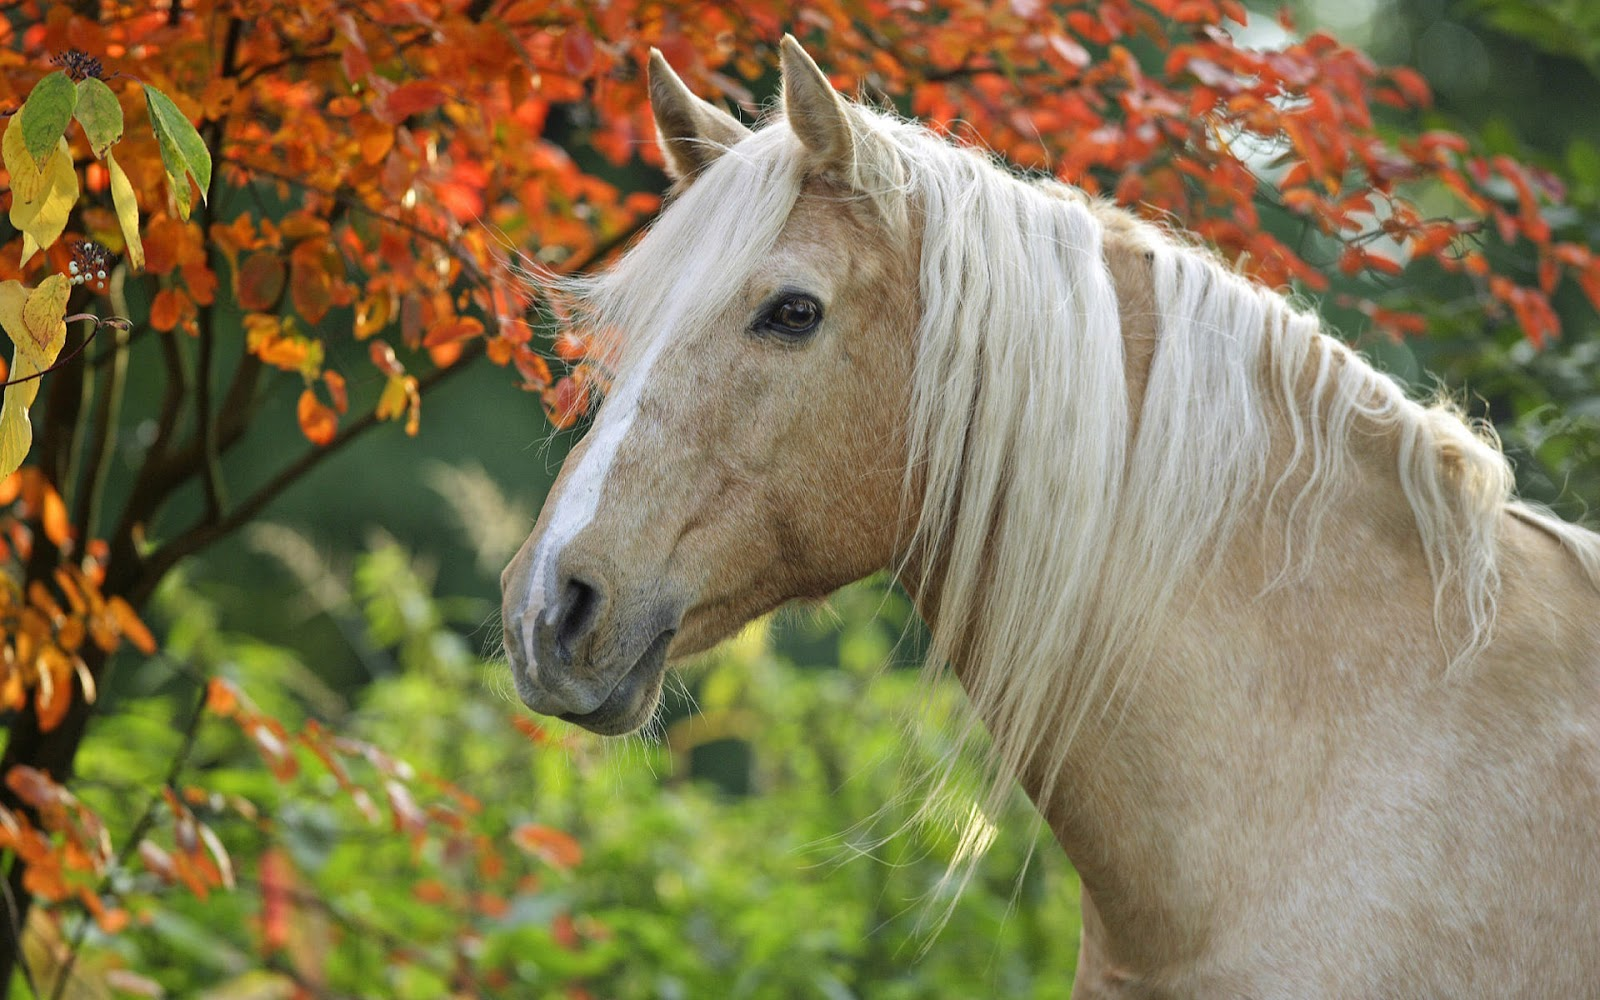 horse wallpaper,horse,mammal,vertebrate,mane,wildlife